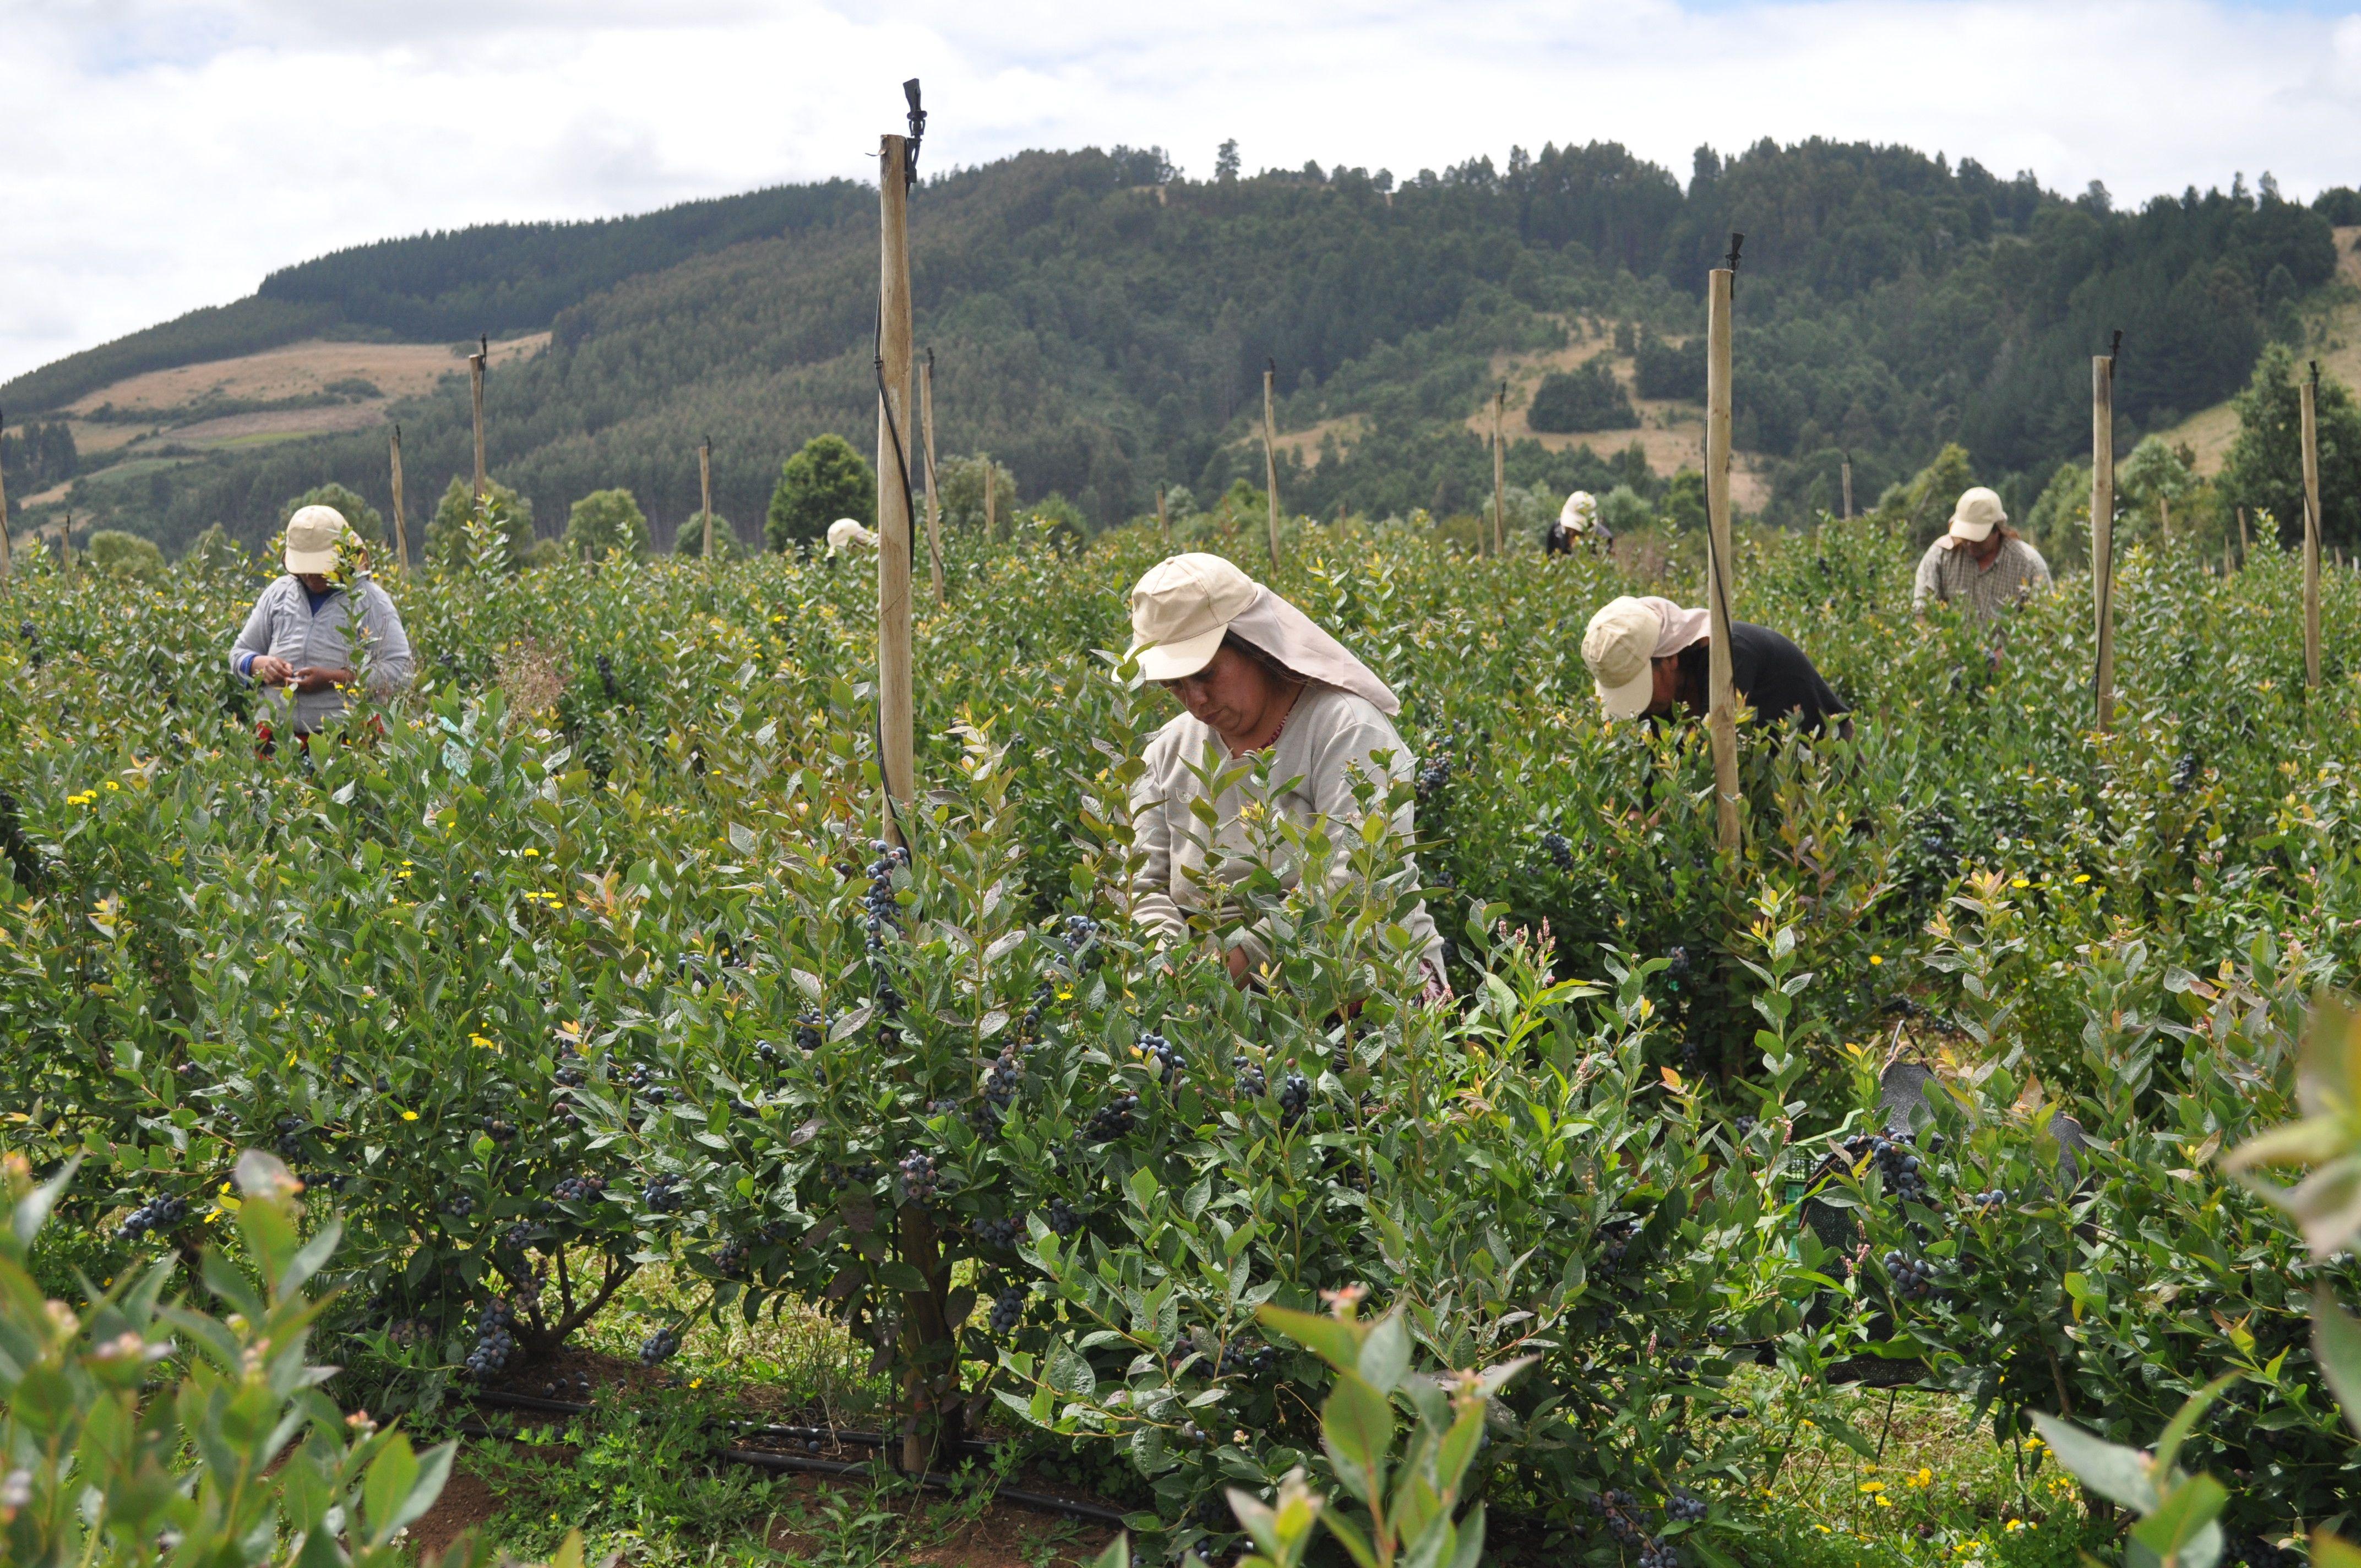 Shared Interest blueberry harvesting Chile